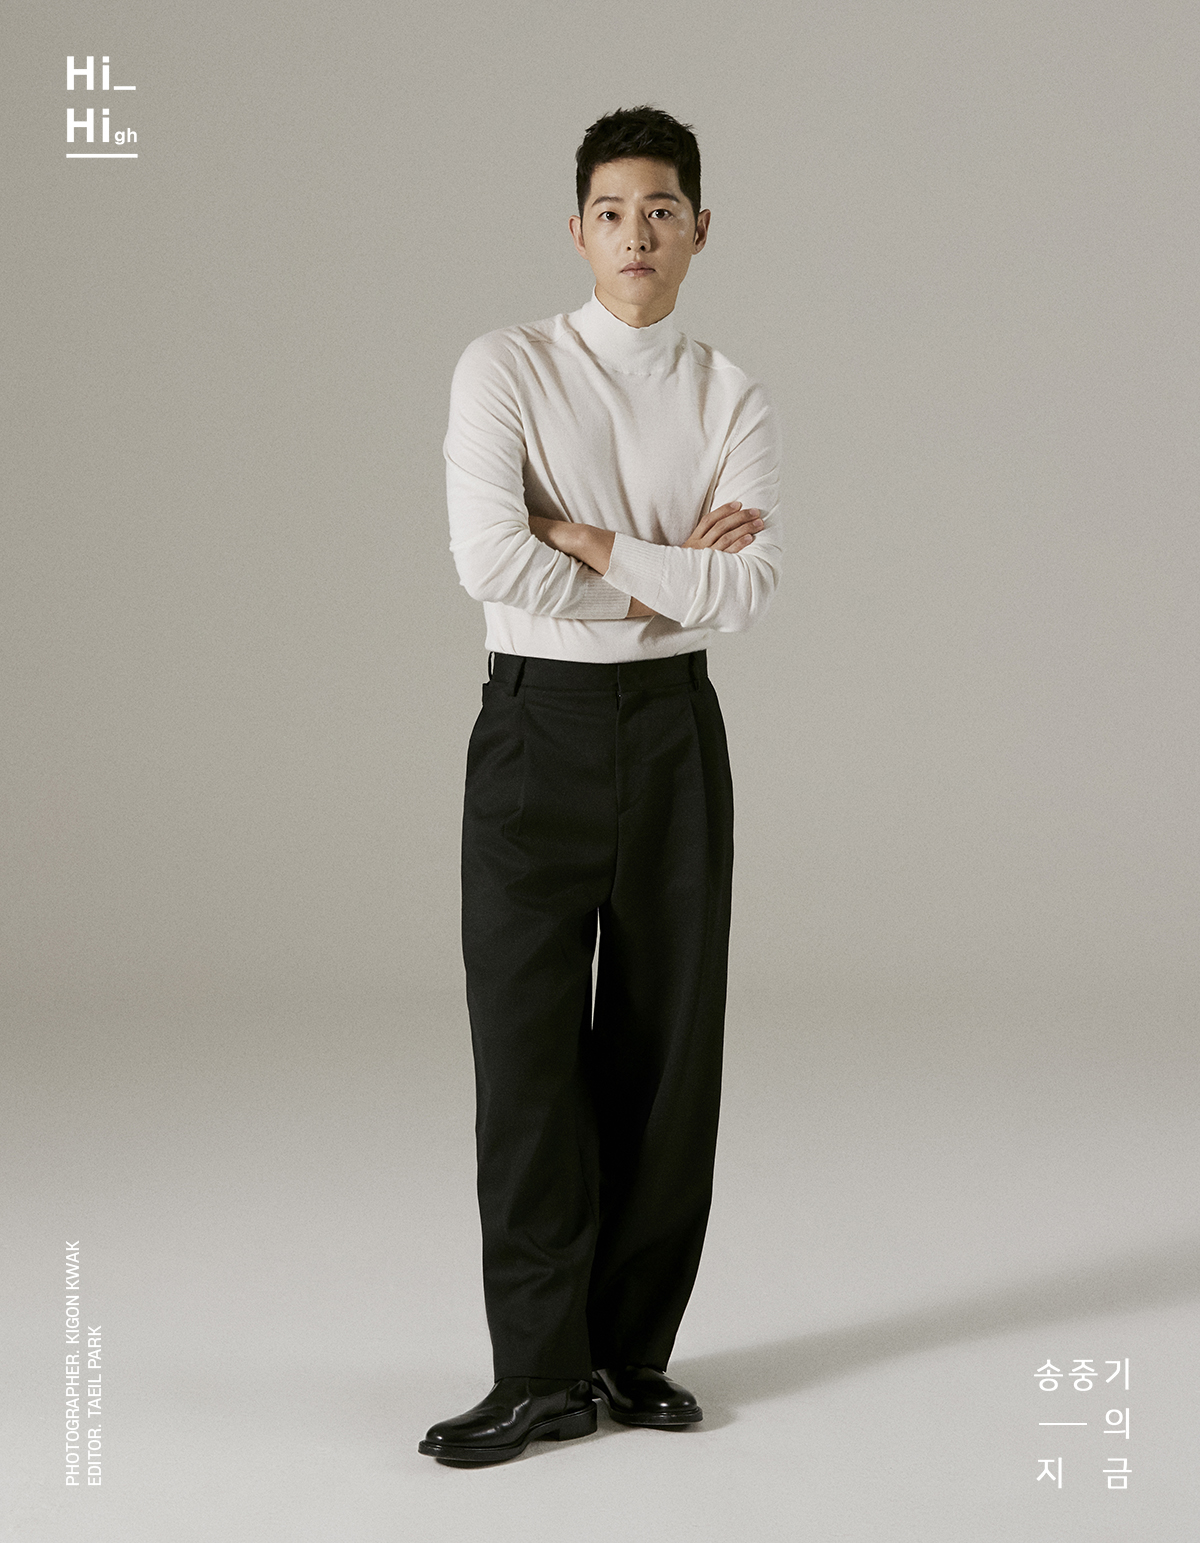 song joong ki interview 2